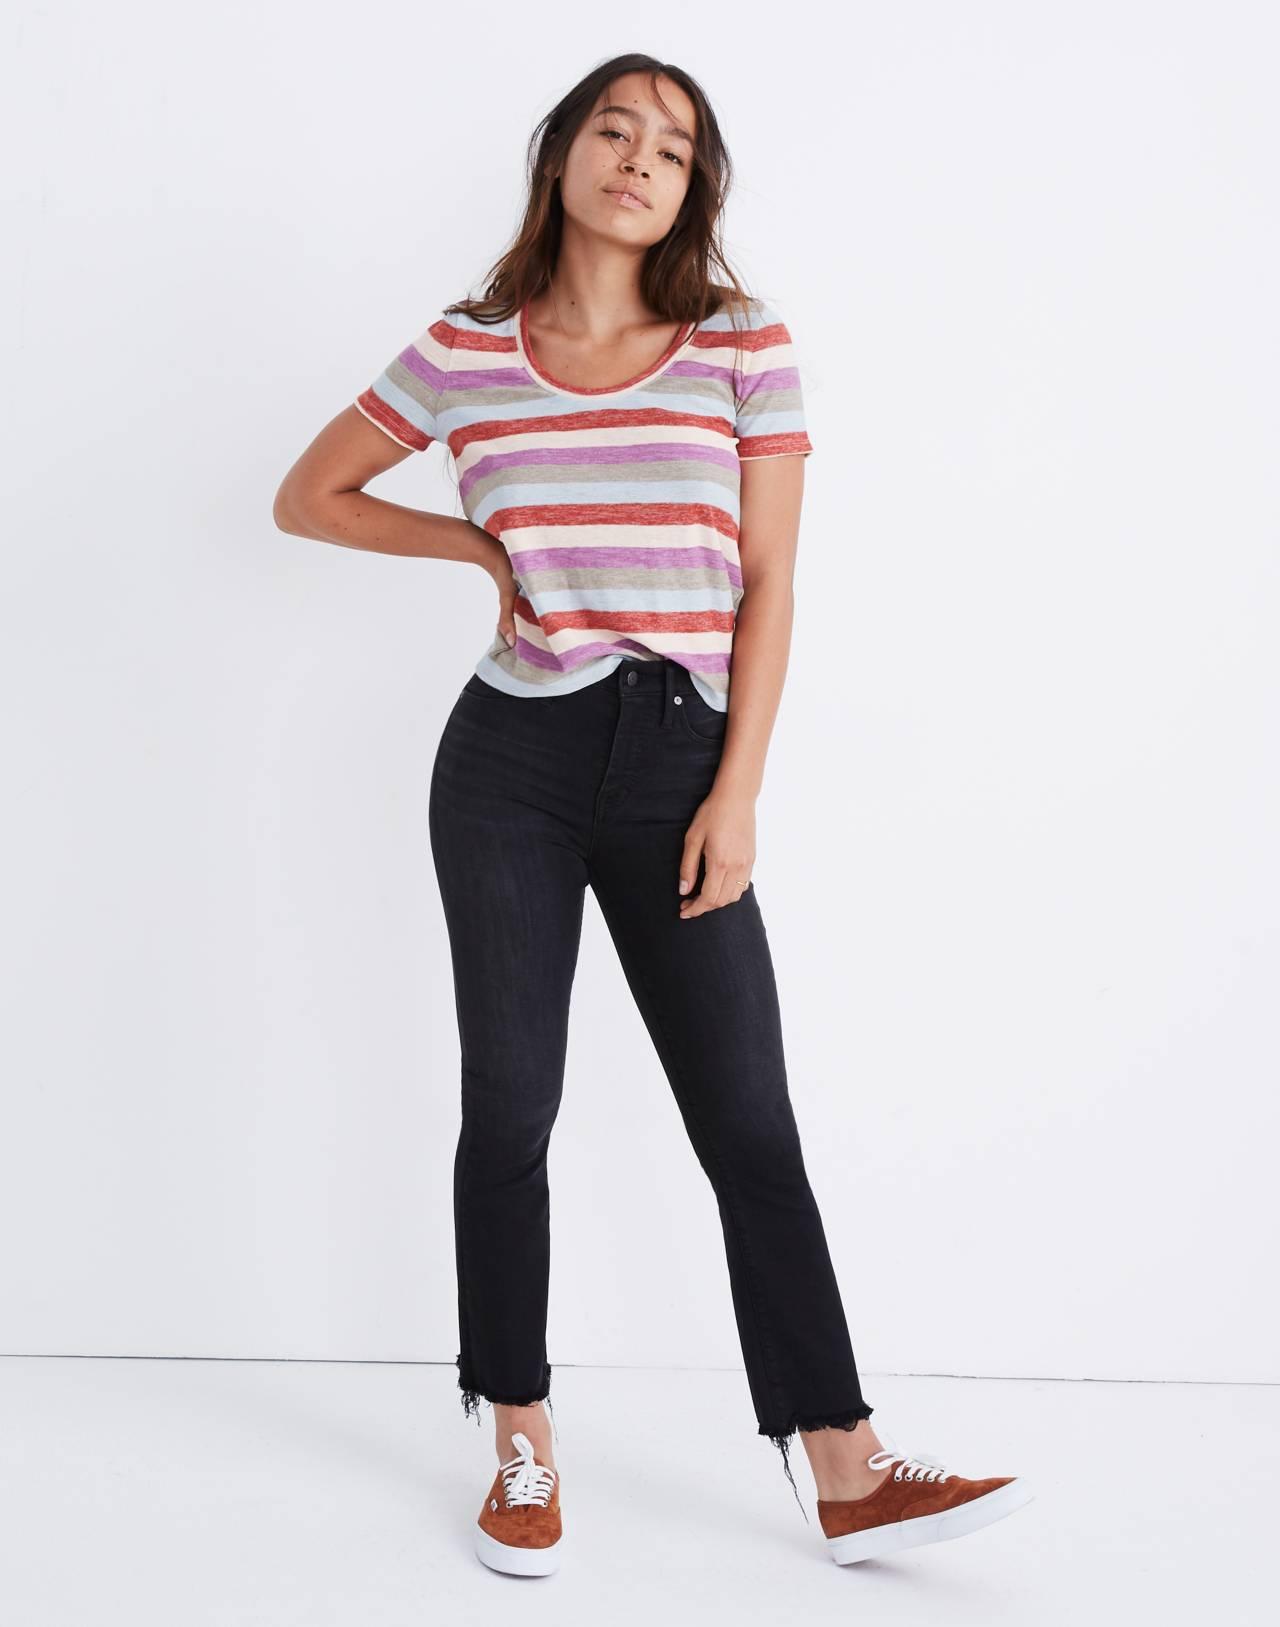 Petite Curvy Cali Demi-Boot Jeans in Berkeley Black: Chewed-Hem Edition in berkeley wash image 2